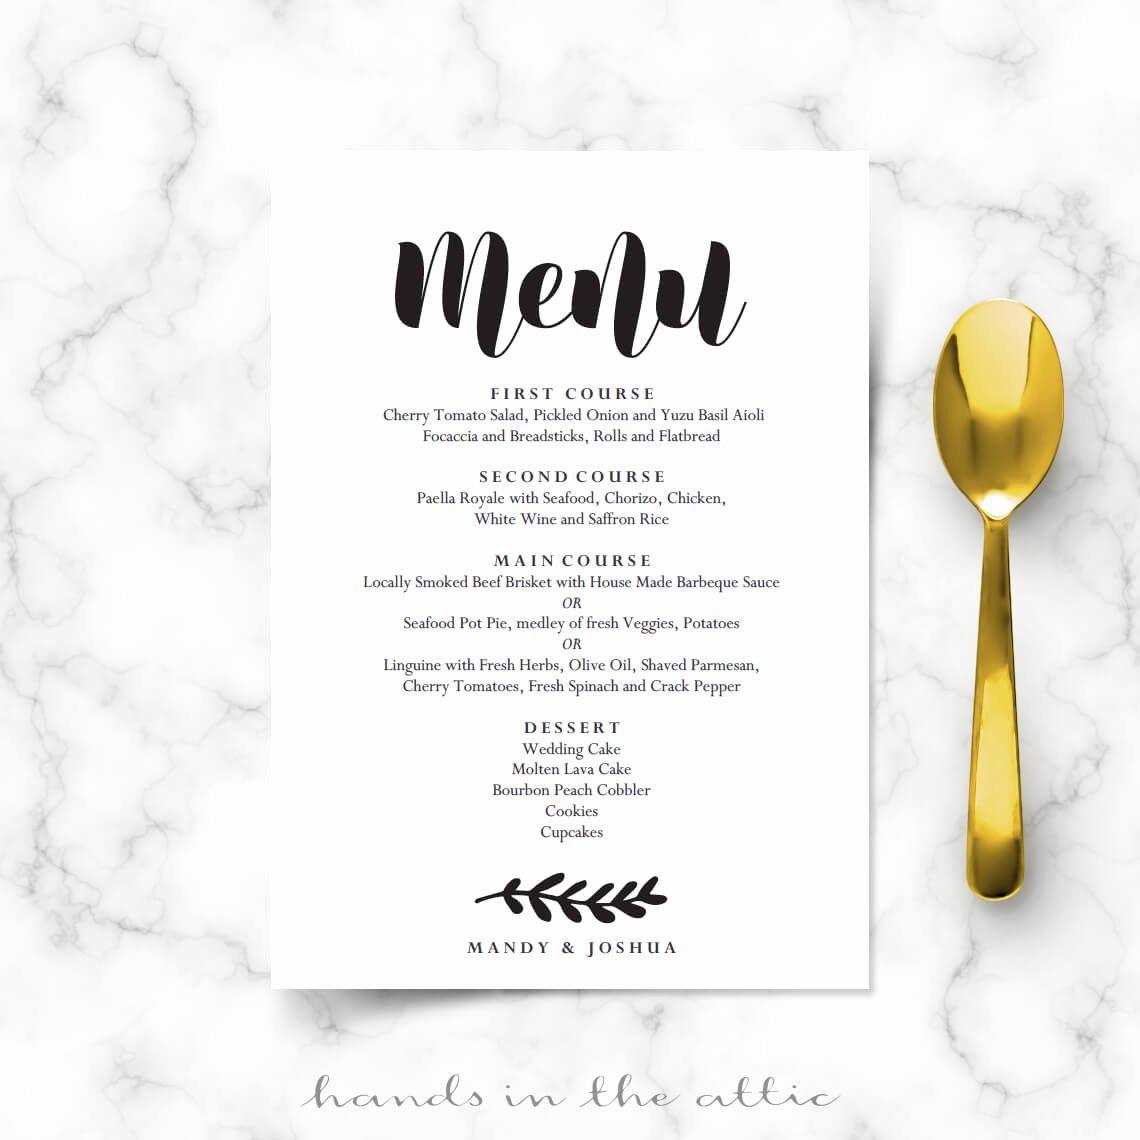 Wedding Menu Cards Template Lovely Simple Wedding Menu Card Printable Templates